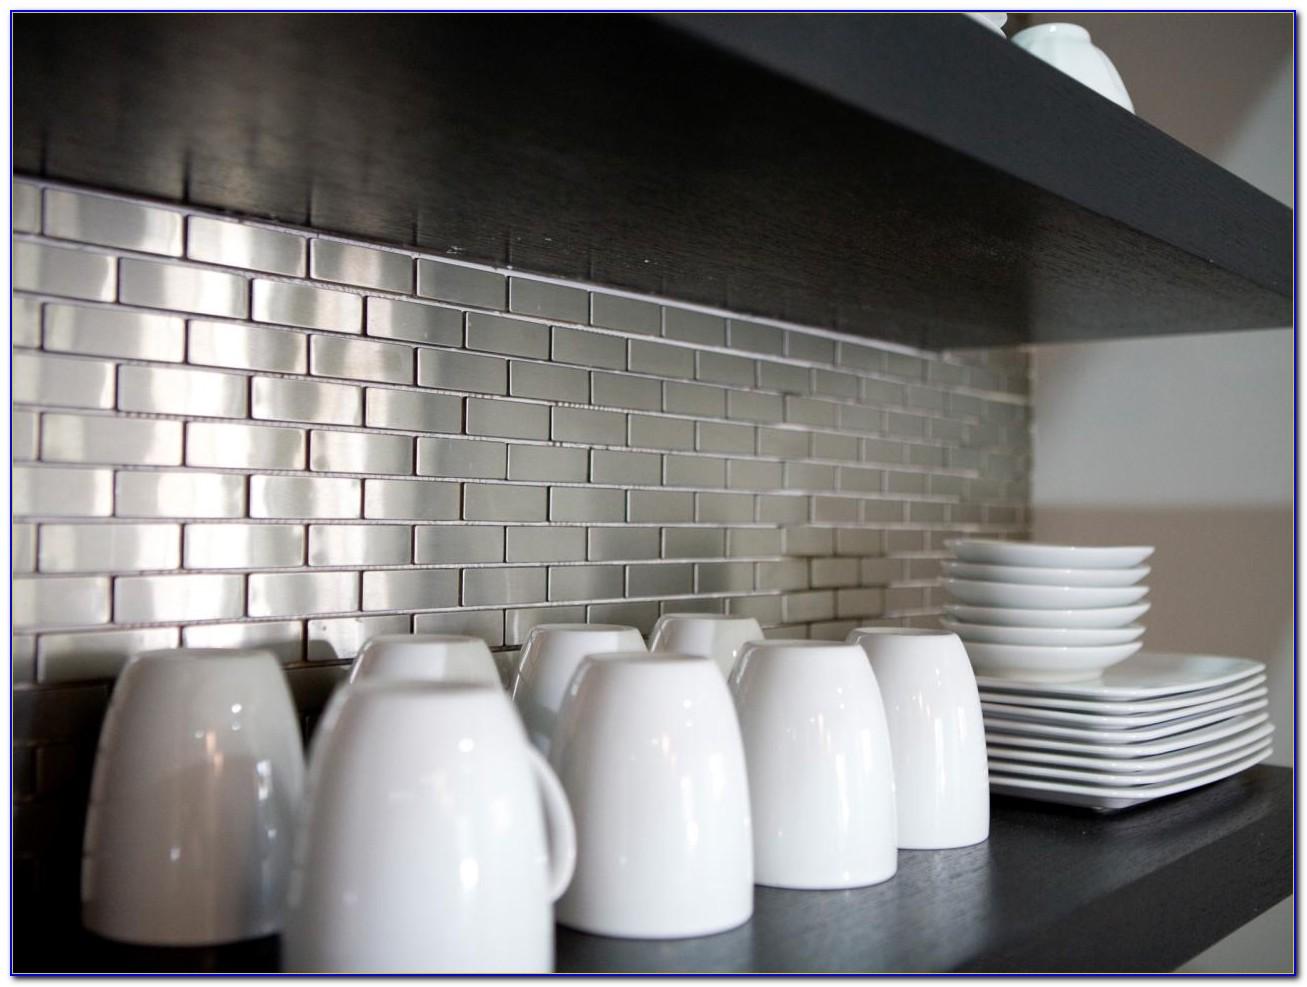 Stainless Steel Tile Backsplash Installation